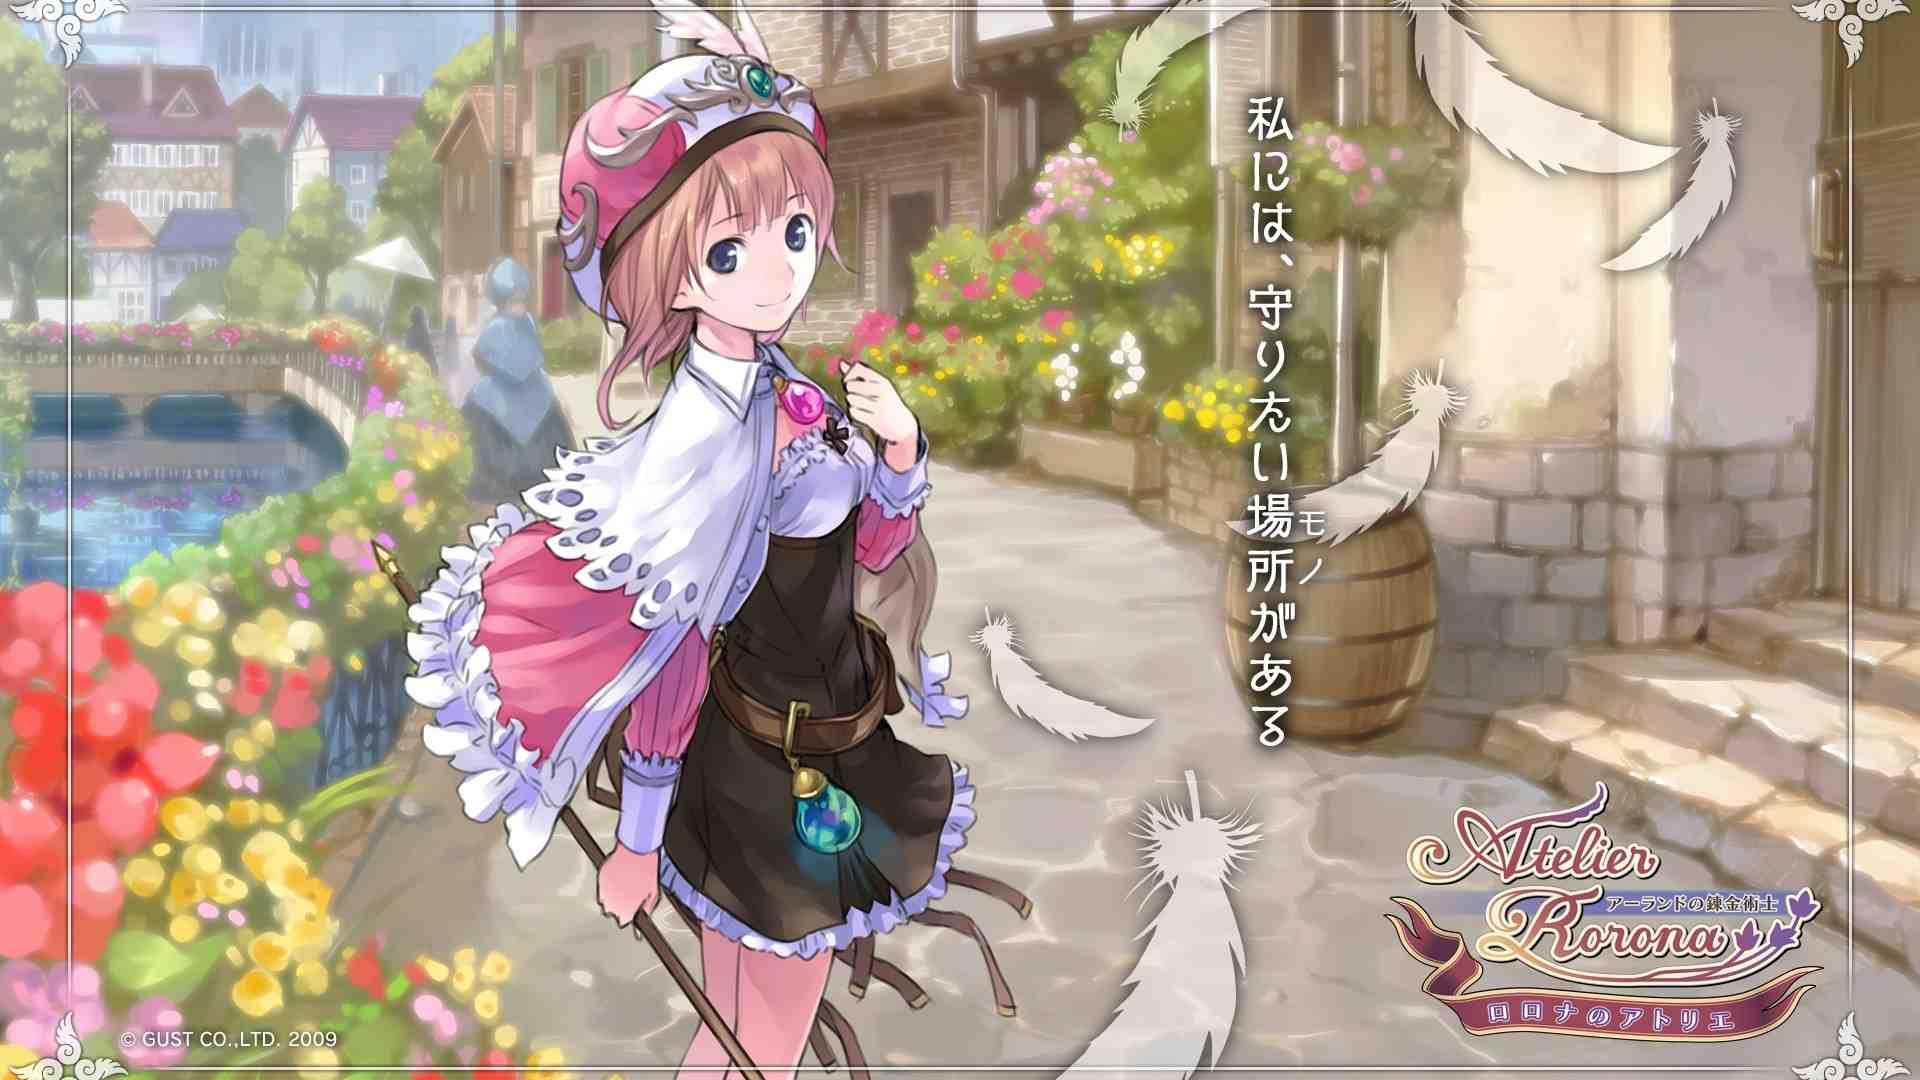 TGS '13: New Atelier Rorona TGS trailer